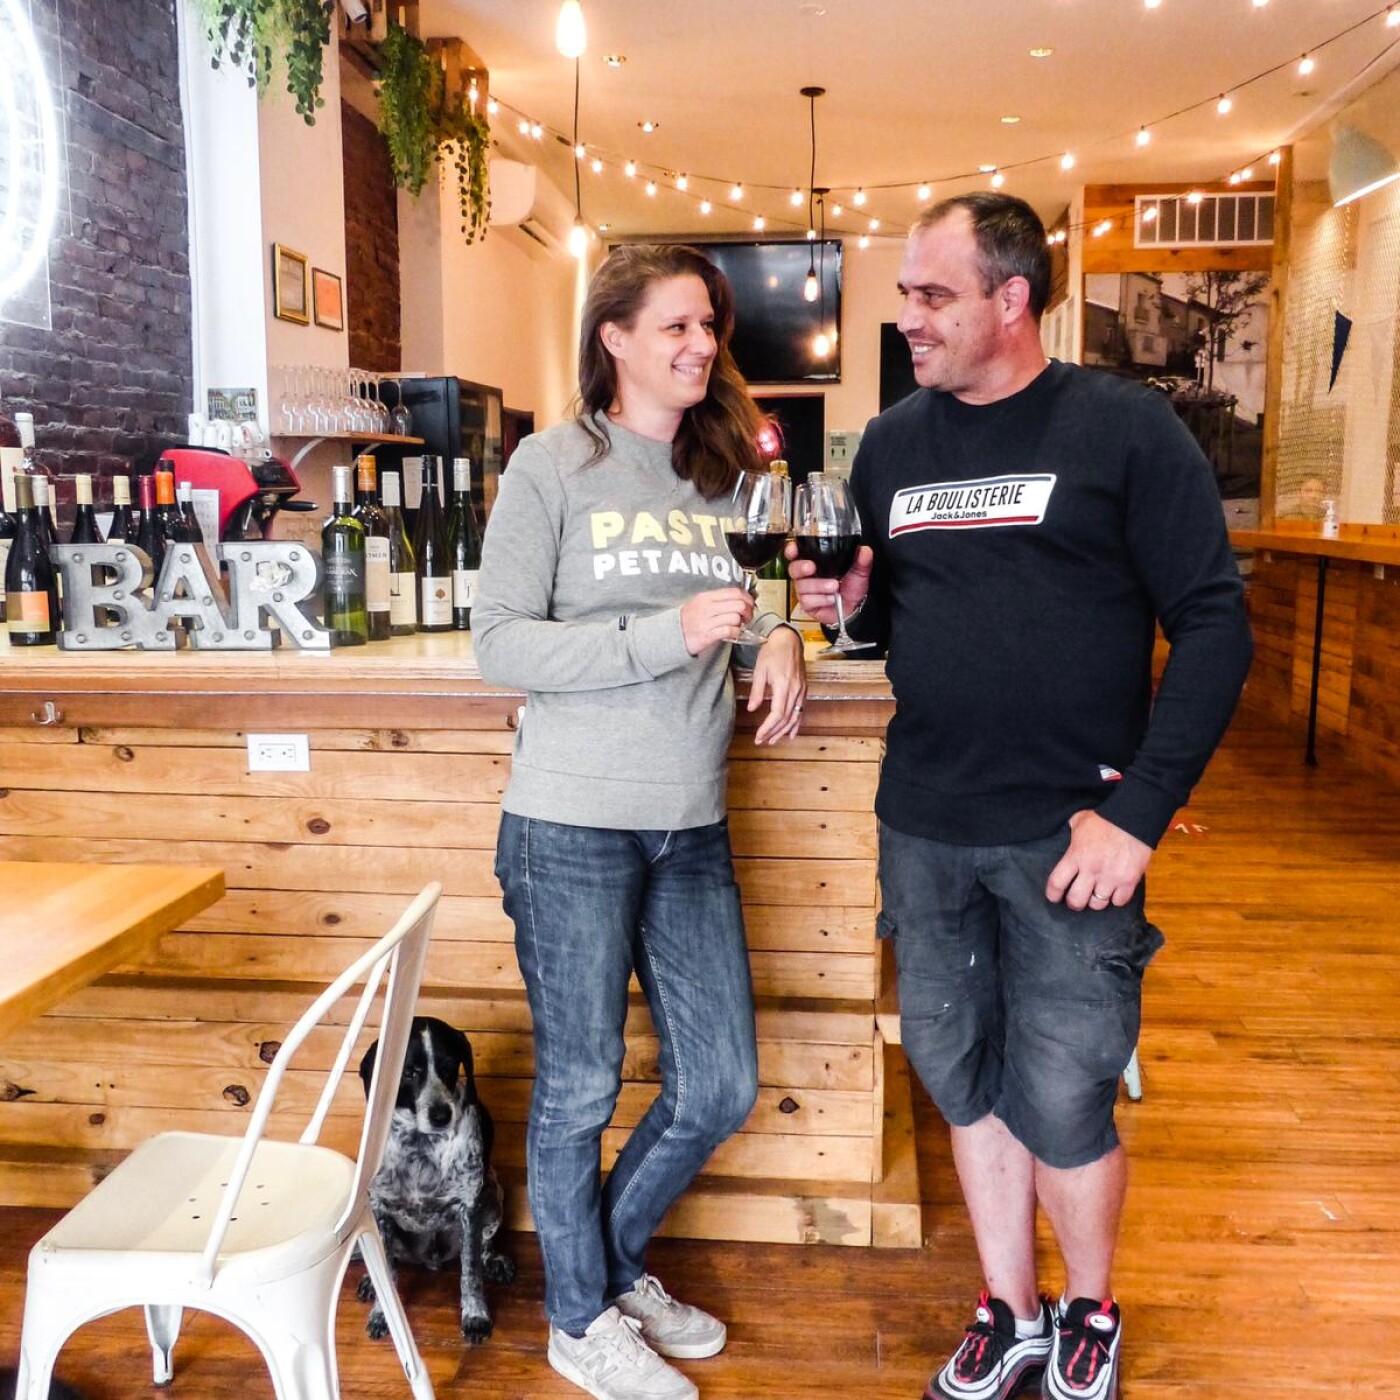 | redif | Alexandra ouvre son bar a vin a NewYork, en partenariat avec LePetitJournal NY - 07 04 21 - StereoChic Radio